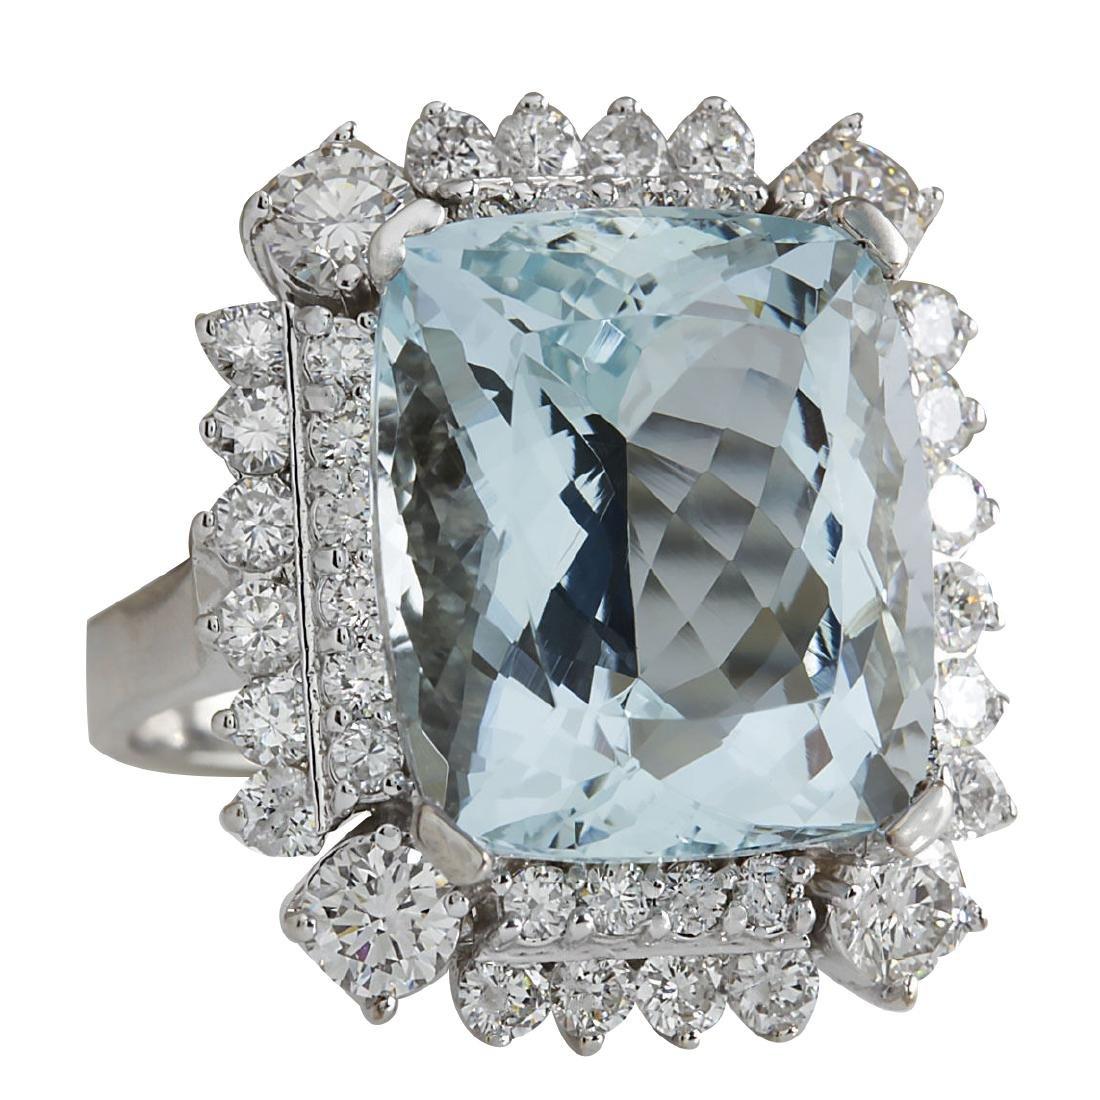 16.54CTW Natural Aquamarine And Diamond Ring In 18K - 2